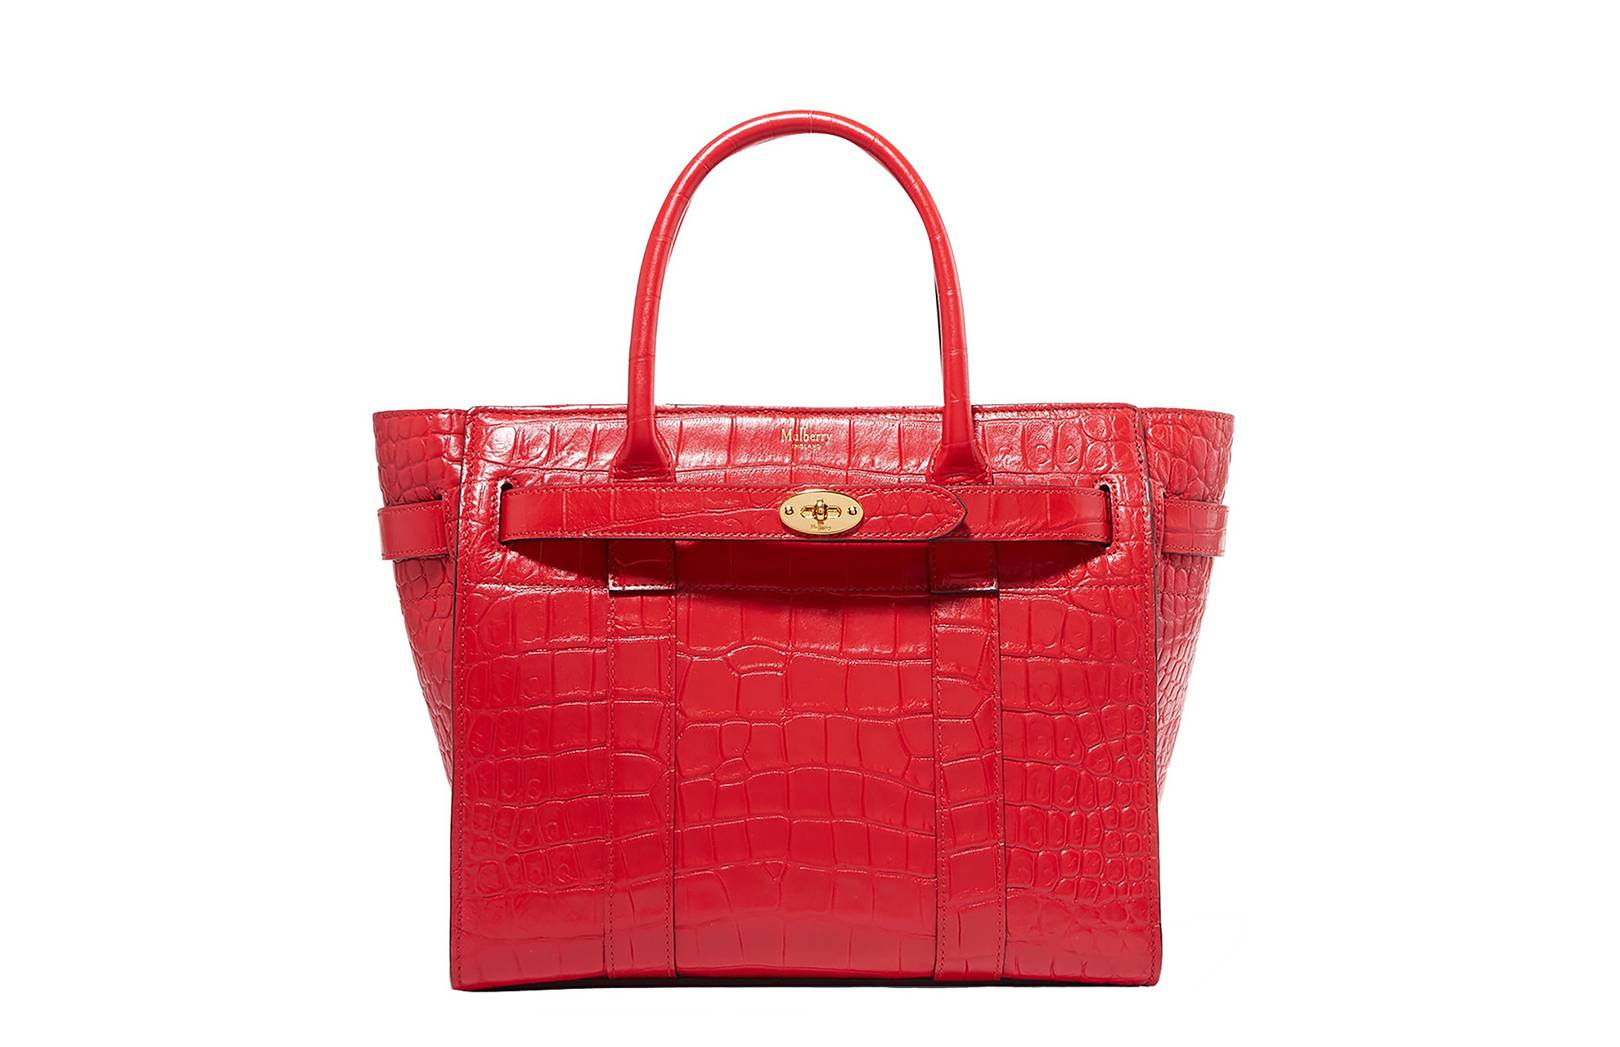 e6de4b2c768 The Best Red Handbags To Wear Now | British Vogue